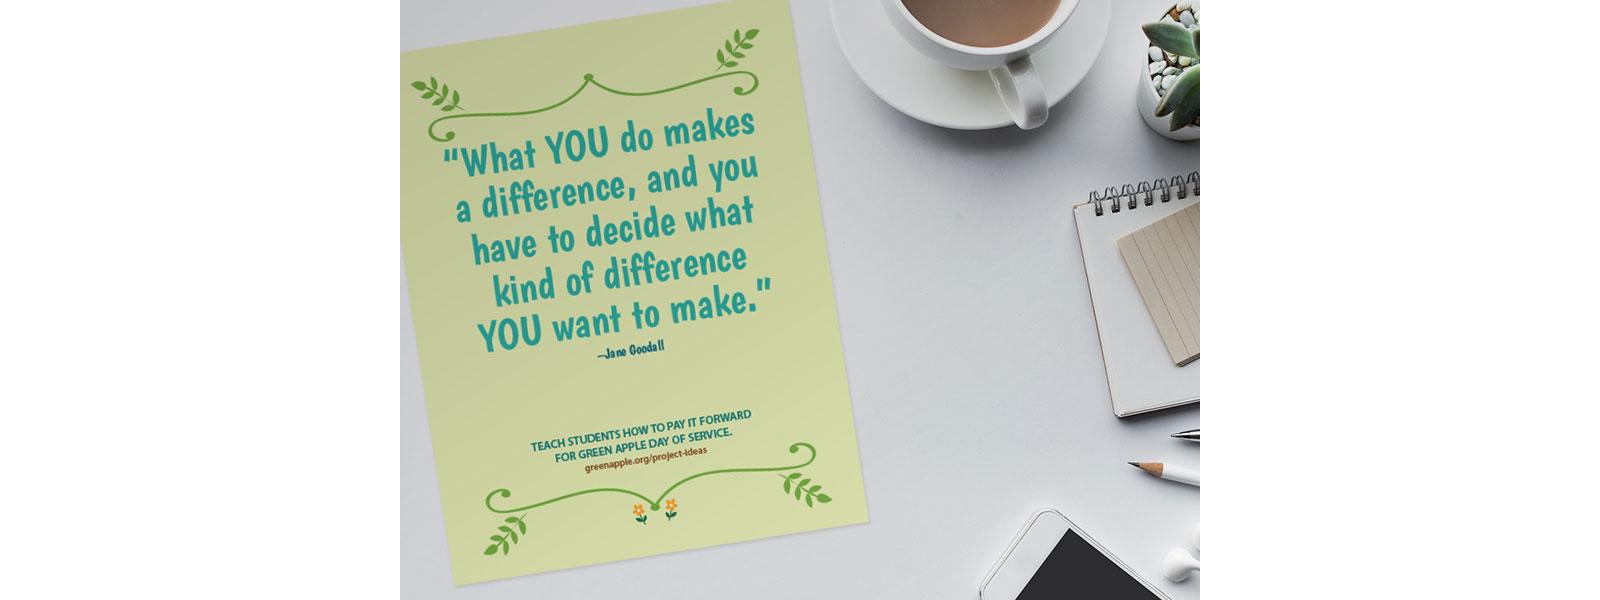 Sustainability Classroom Poster Set, Image 5